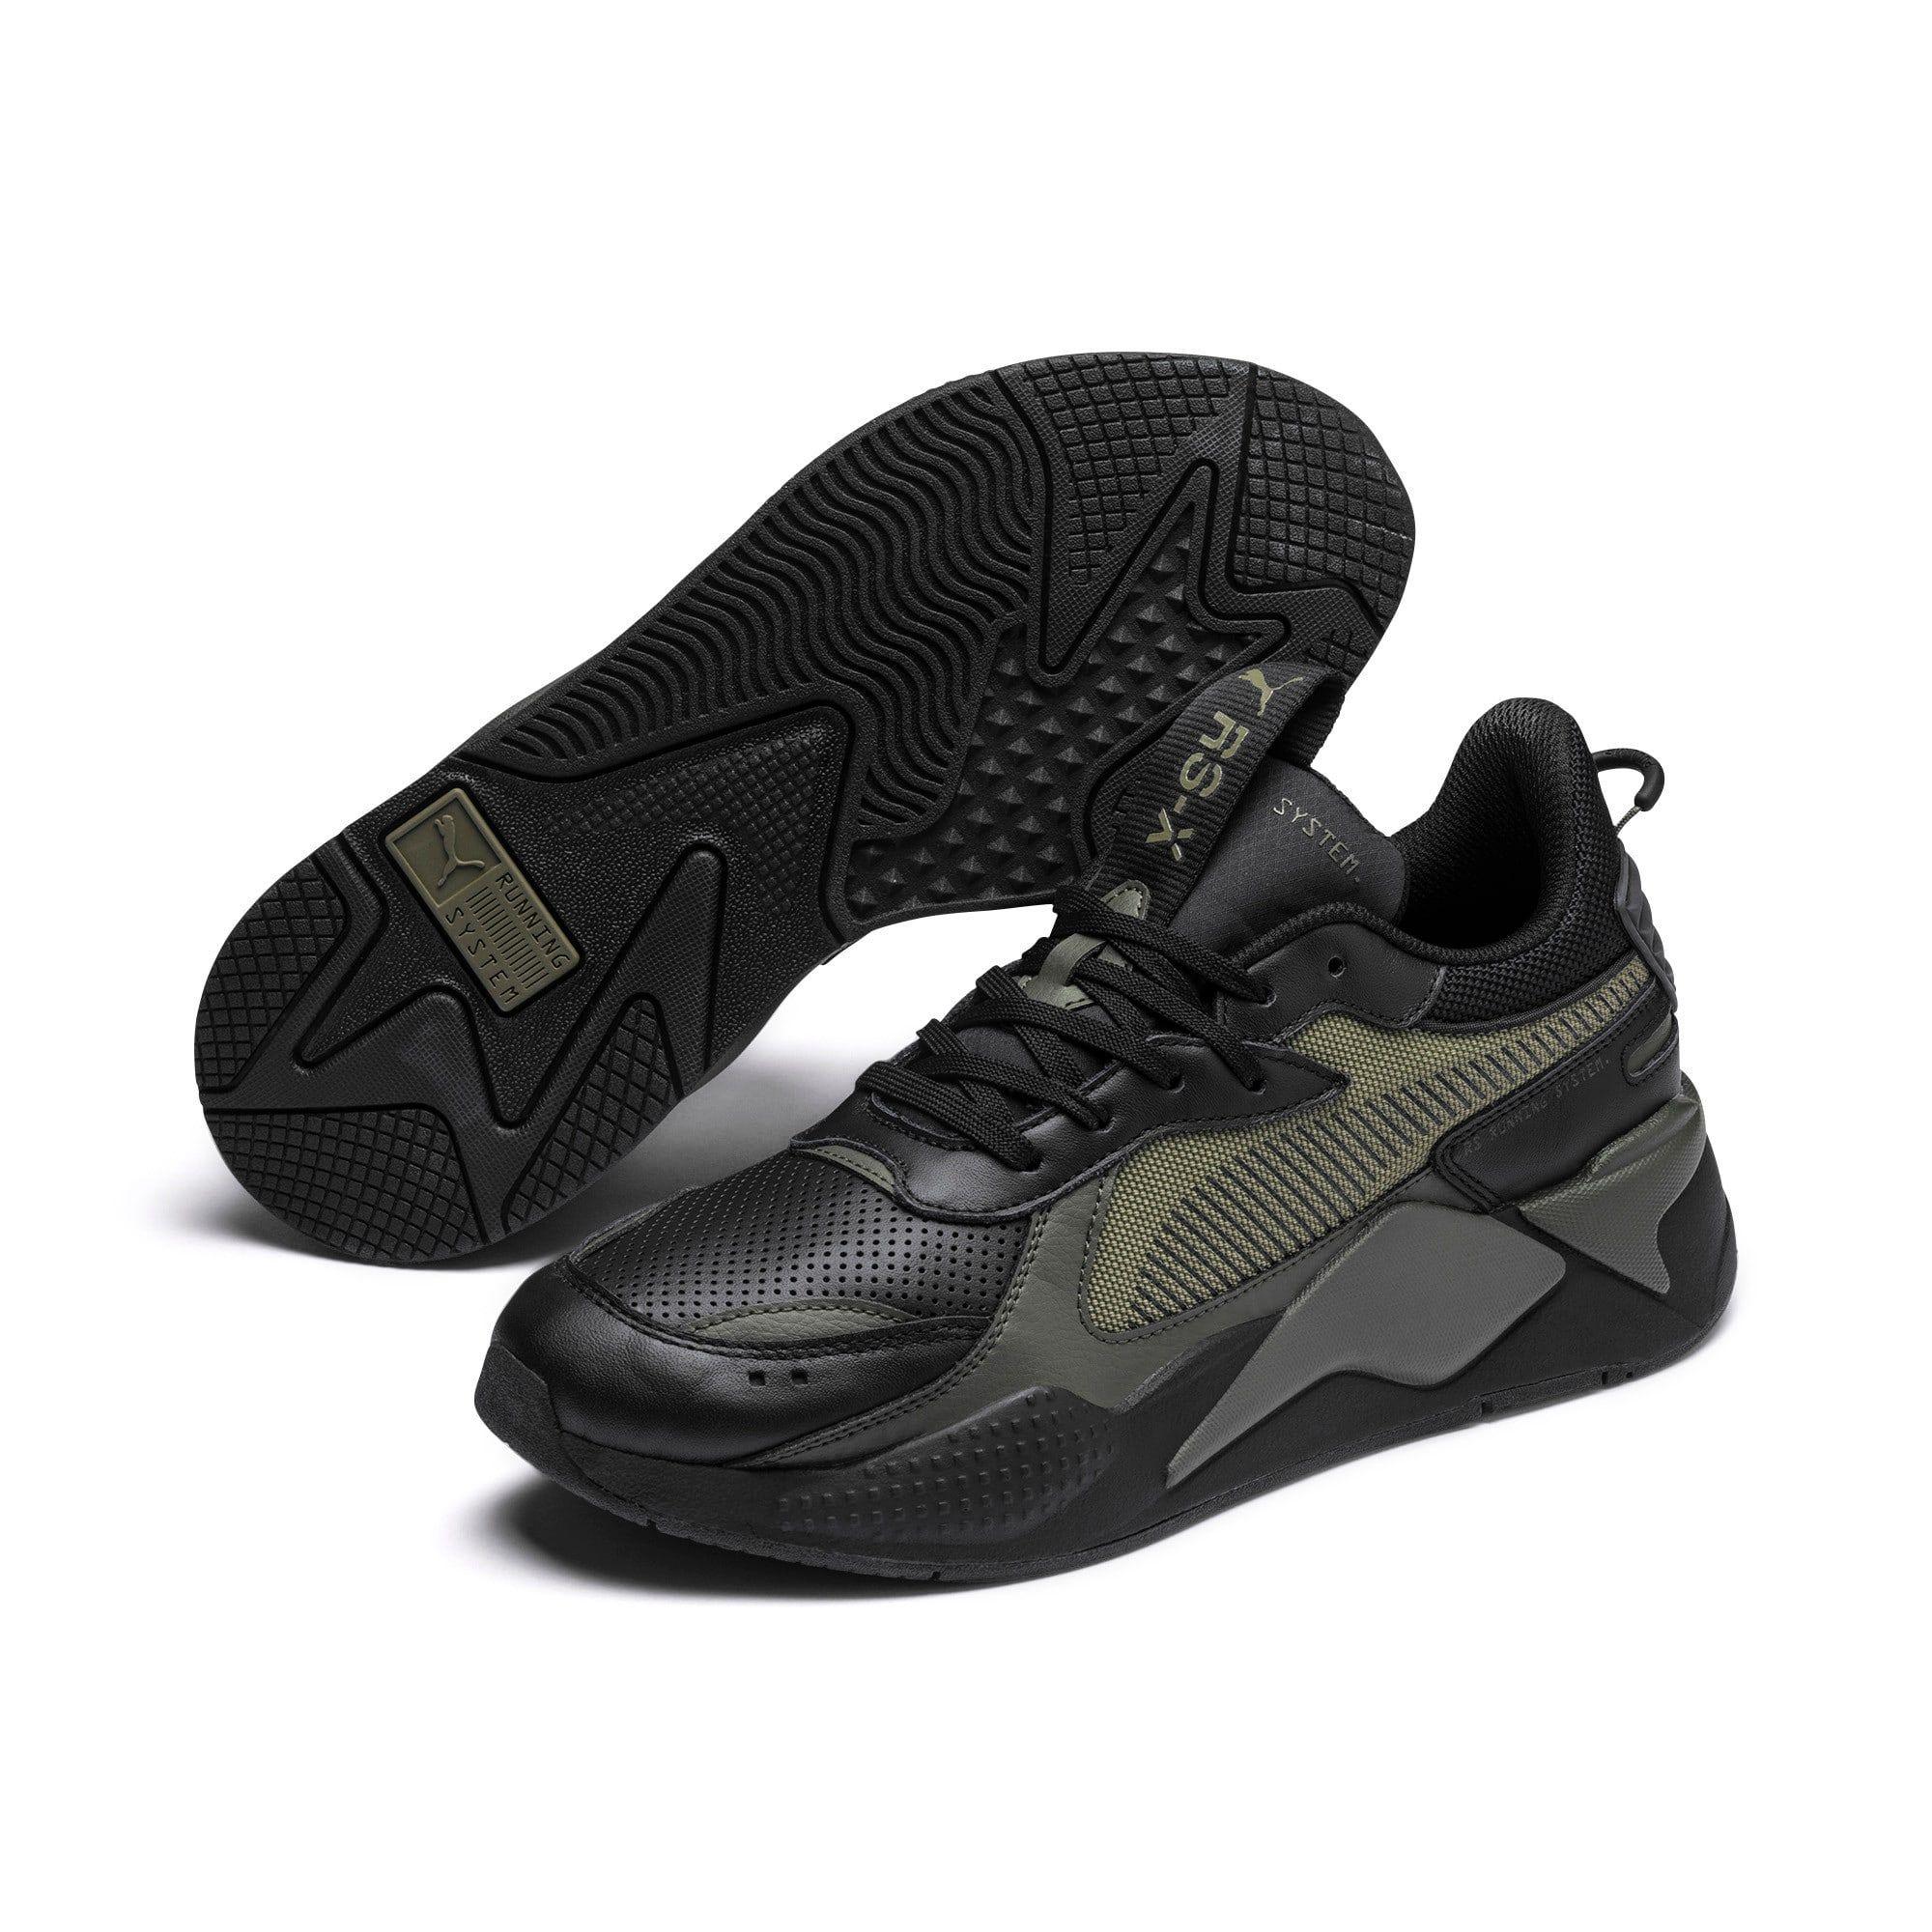 PUMA Chaussure Basket RS X Winterised, NoirVert, Taille